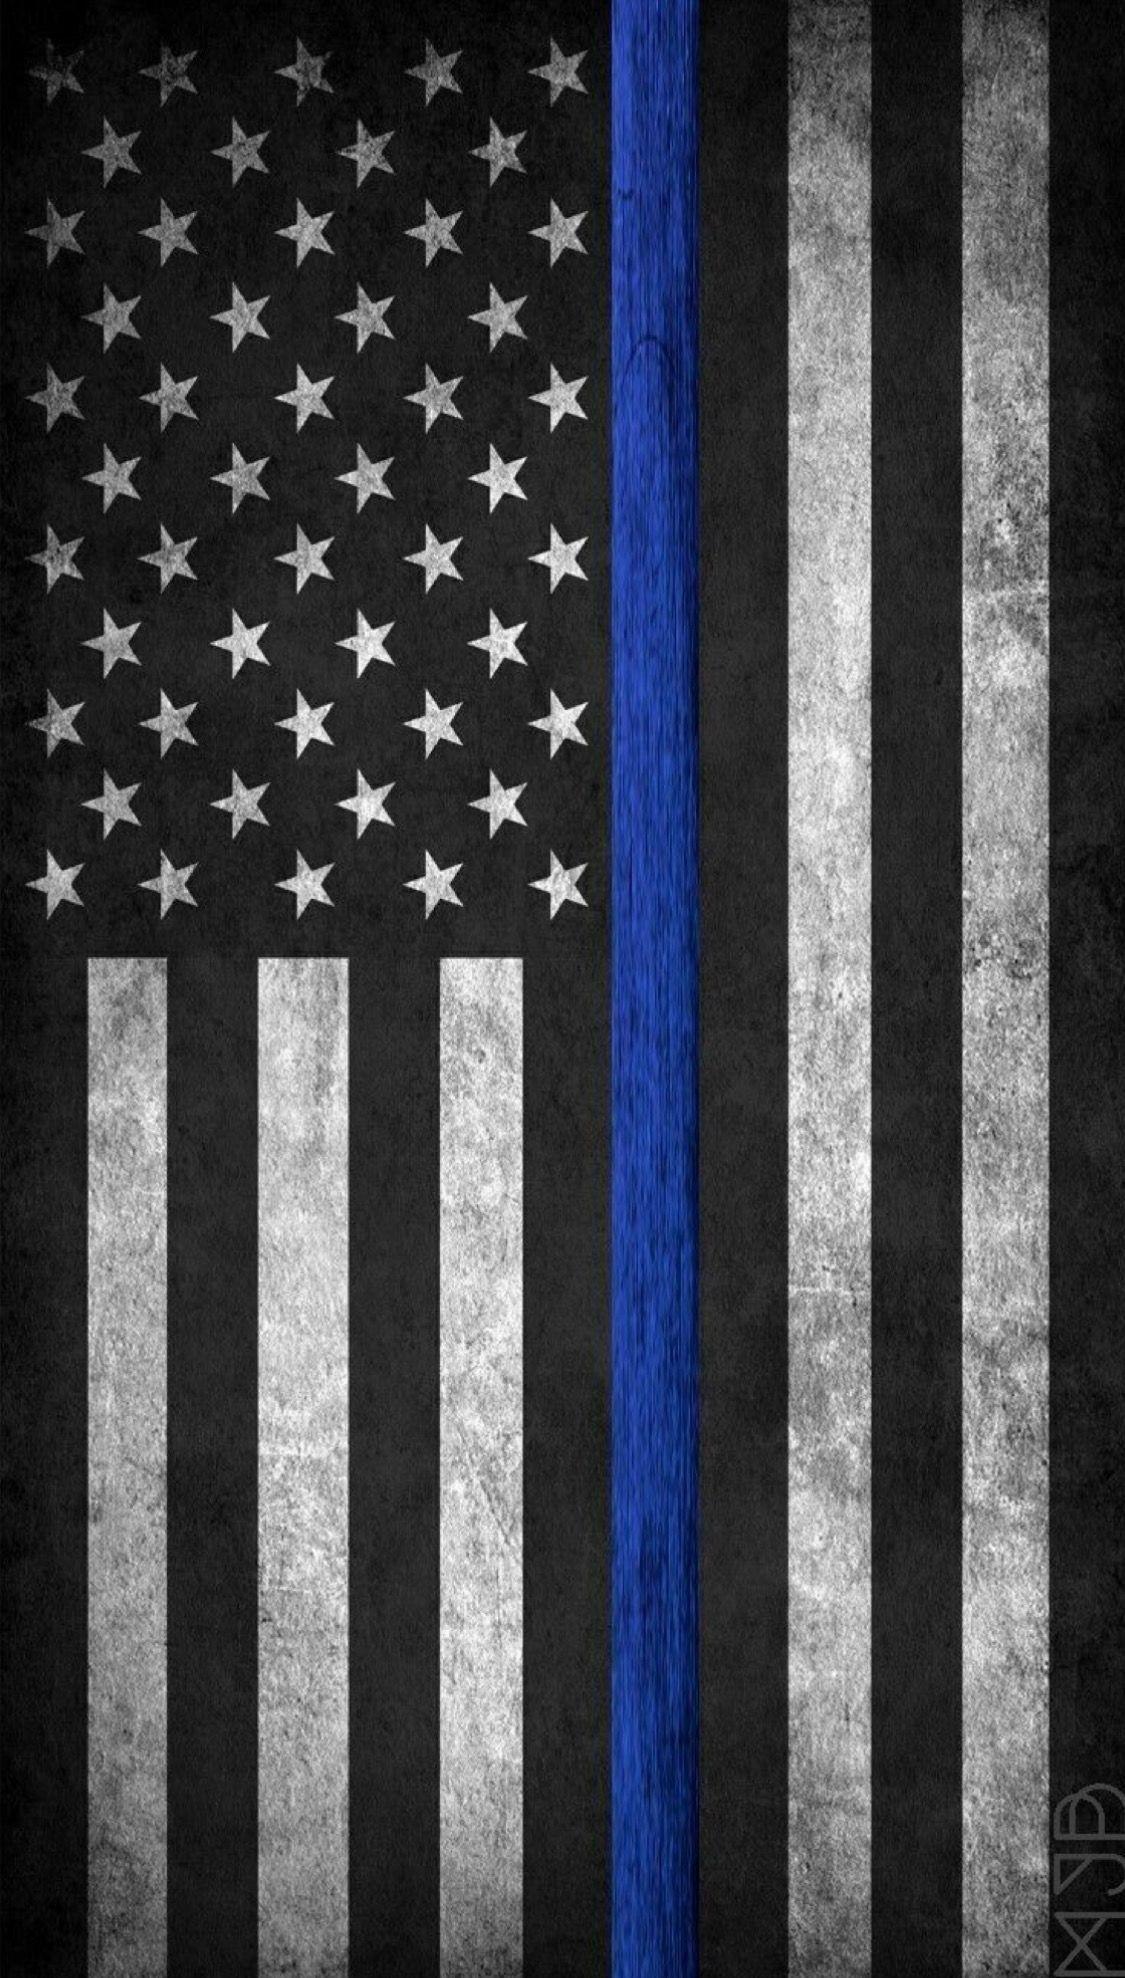 Pin By Flaviolaraestrada Lara On Photography Flags Wallpaper Thin Blue Line Wallpaper American Flag Wallpaper